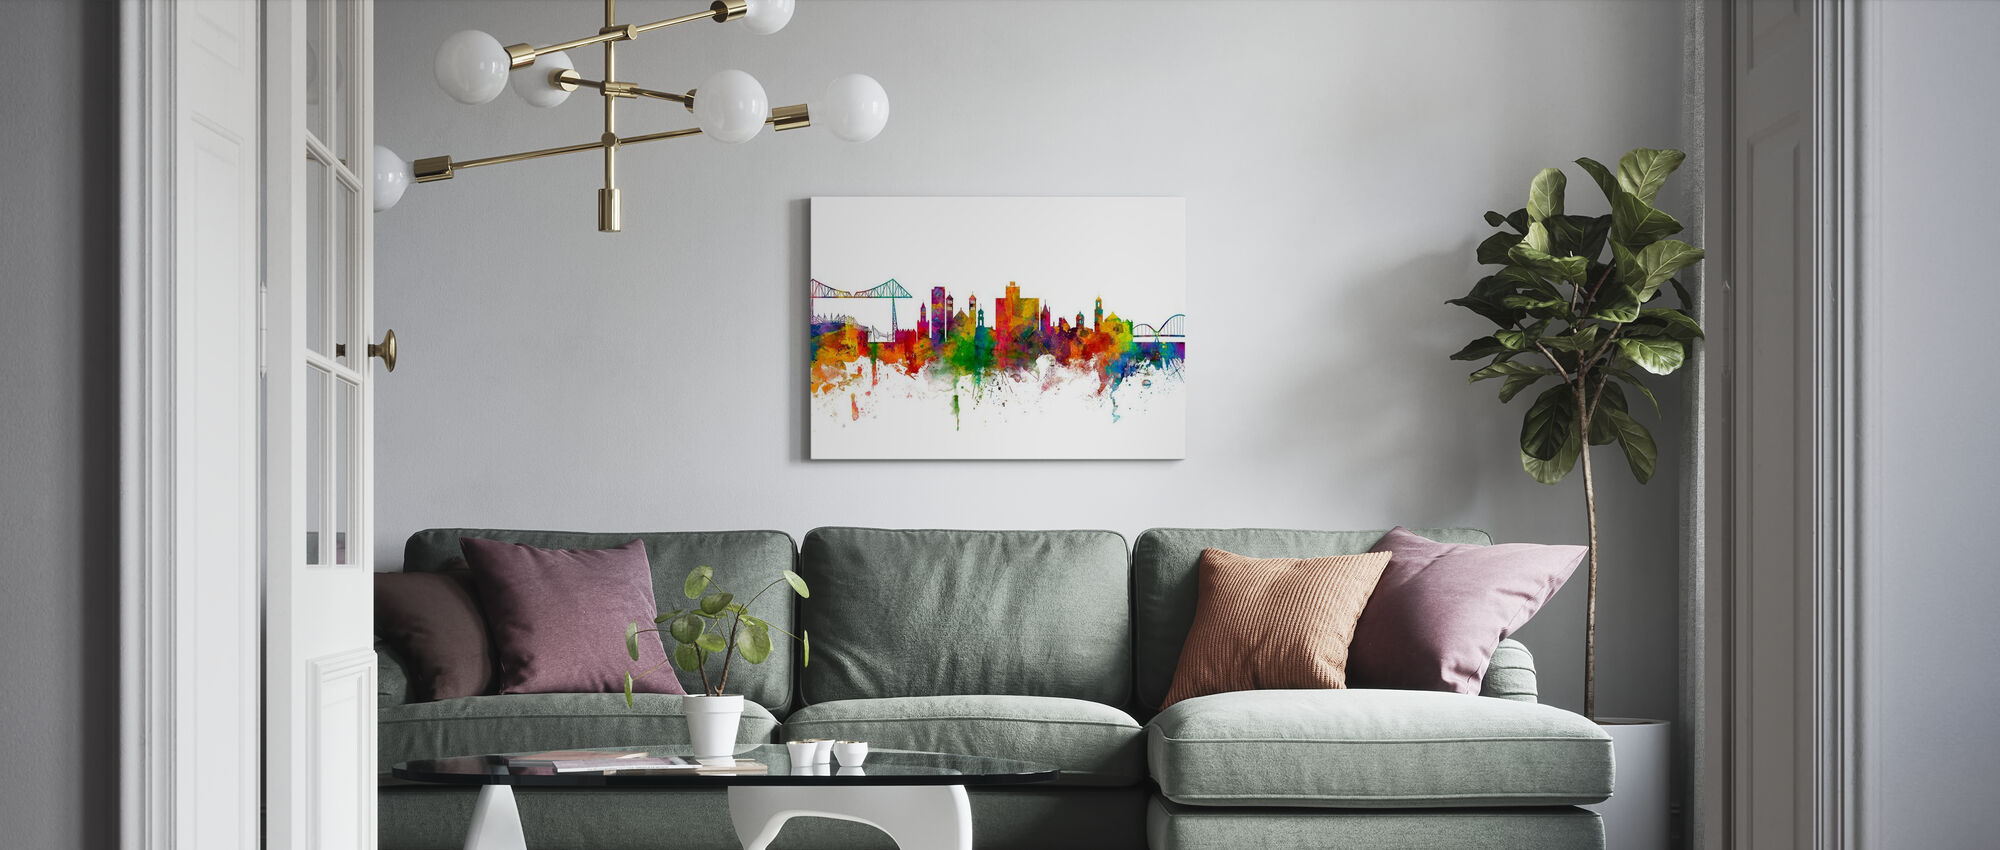 Middlesbrough Skyline - Canvas print - Living Room